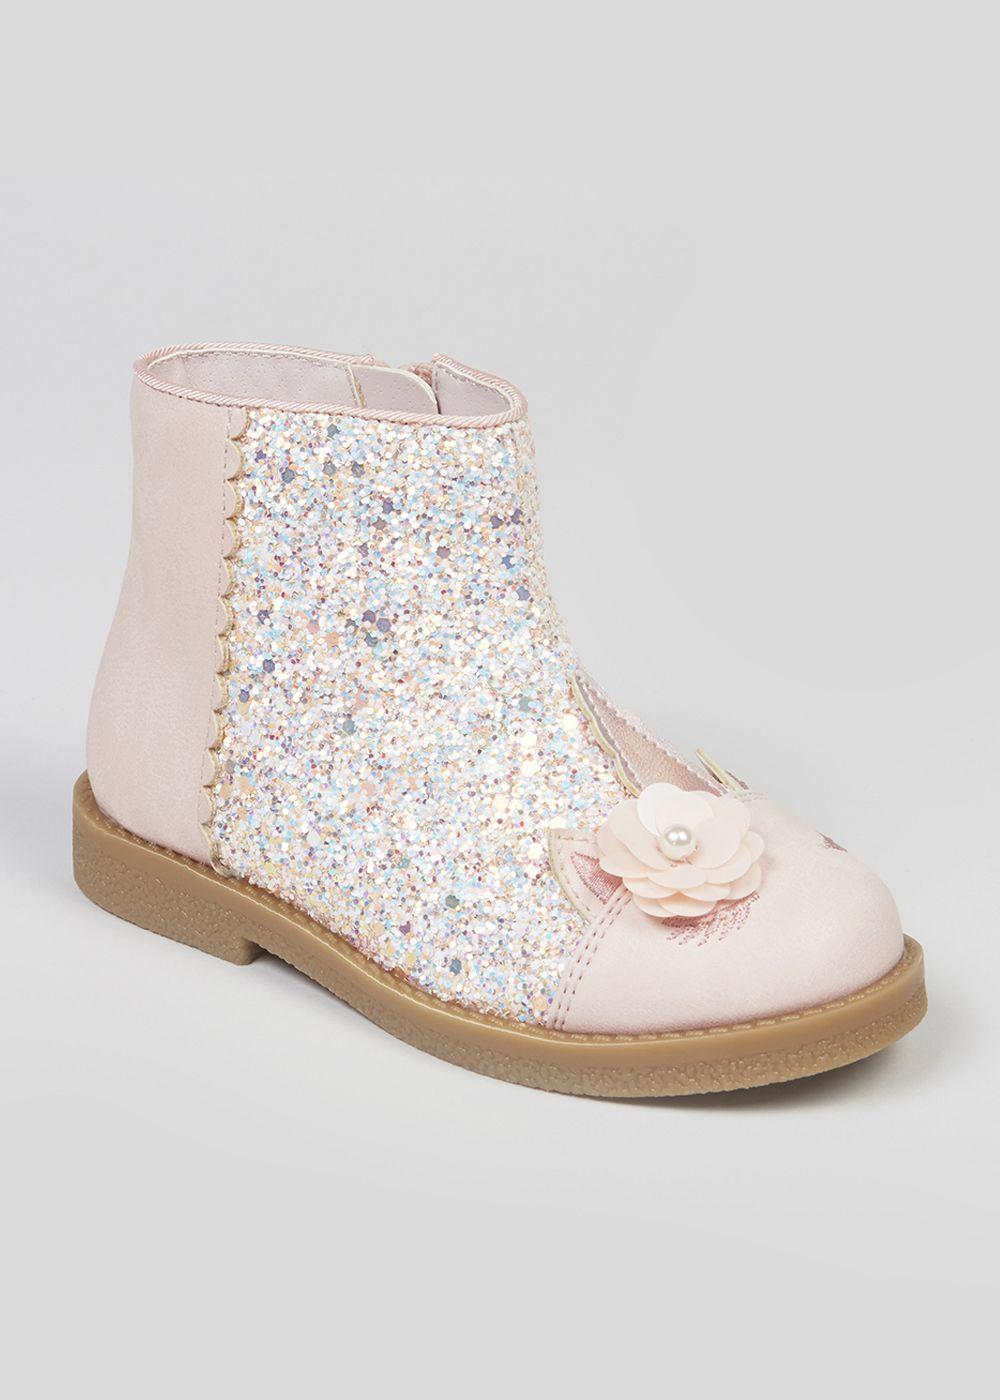 bb0bbebd864f Girls Unicorn Glitter Boots (Younger 4-12) – Pastel Pink – Matalan